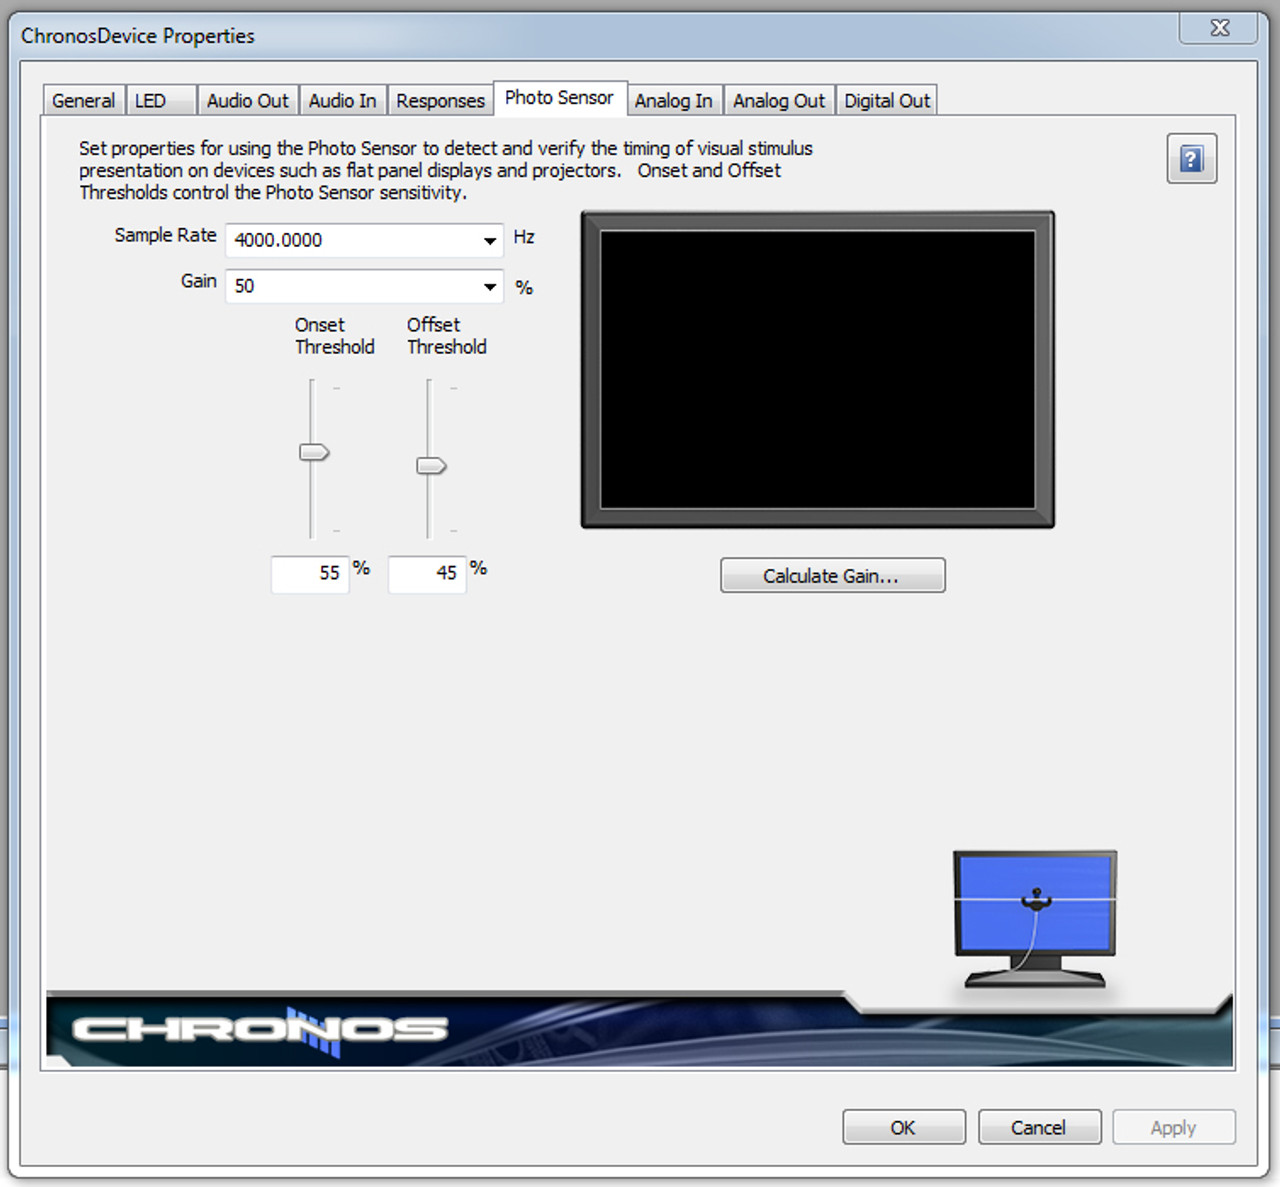 Chronos Device Properties in E-Prime